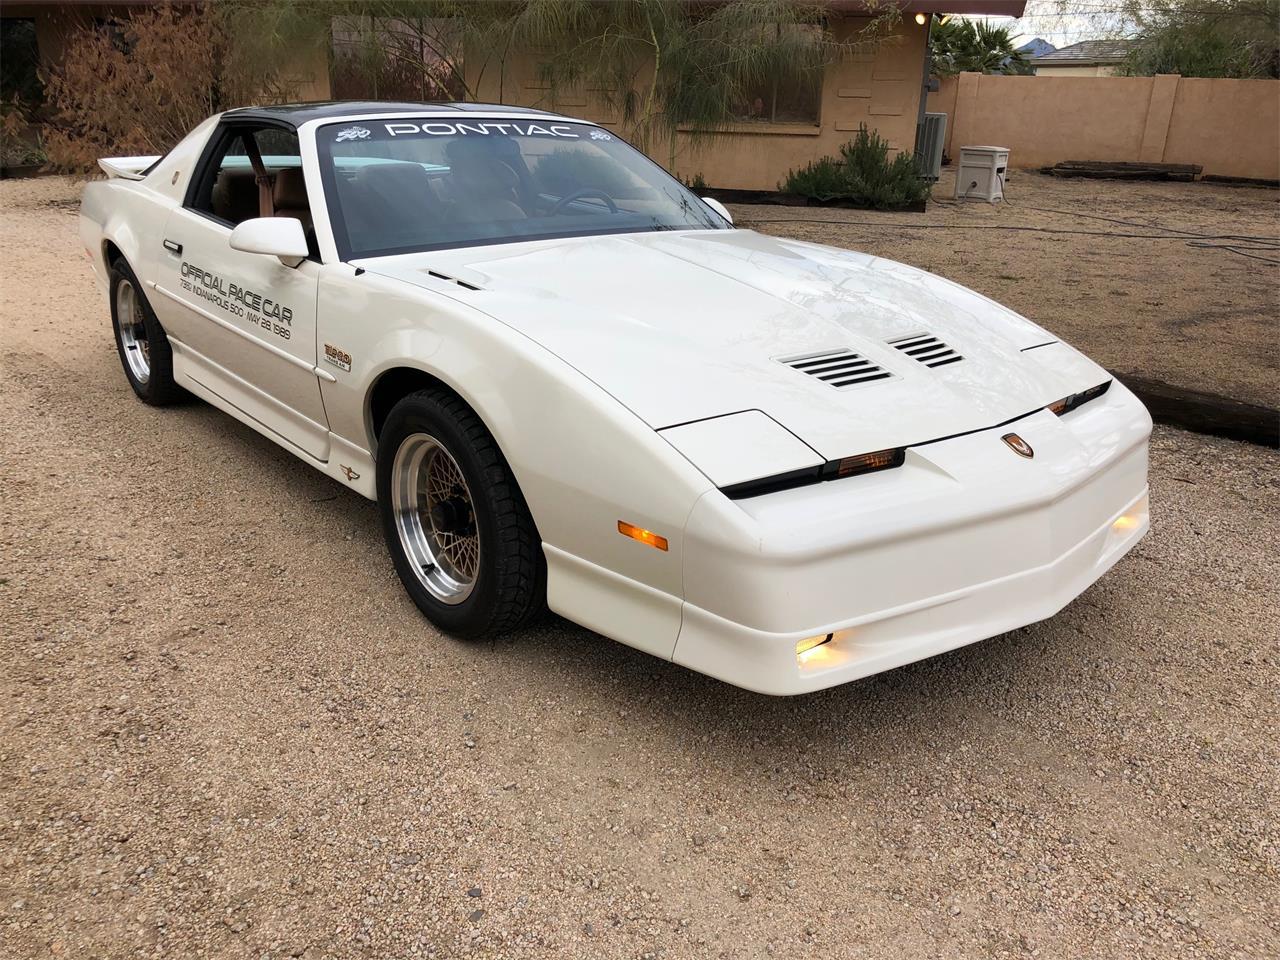 1989 Pontiac Firebird Trans Am Turbo Indy Pace Car Edition (CC-1192465) for sale in Scottsdale, Arizona